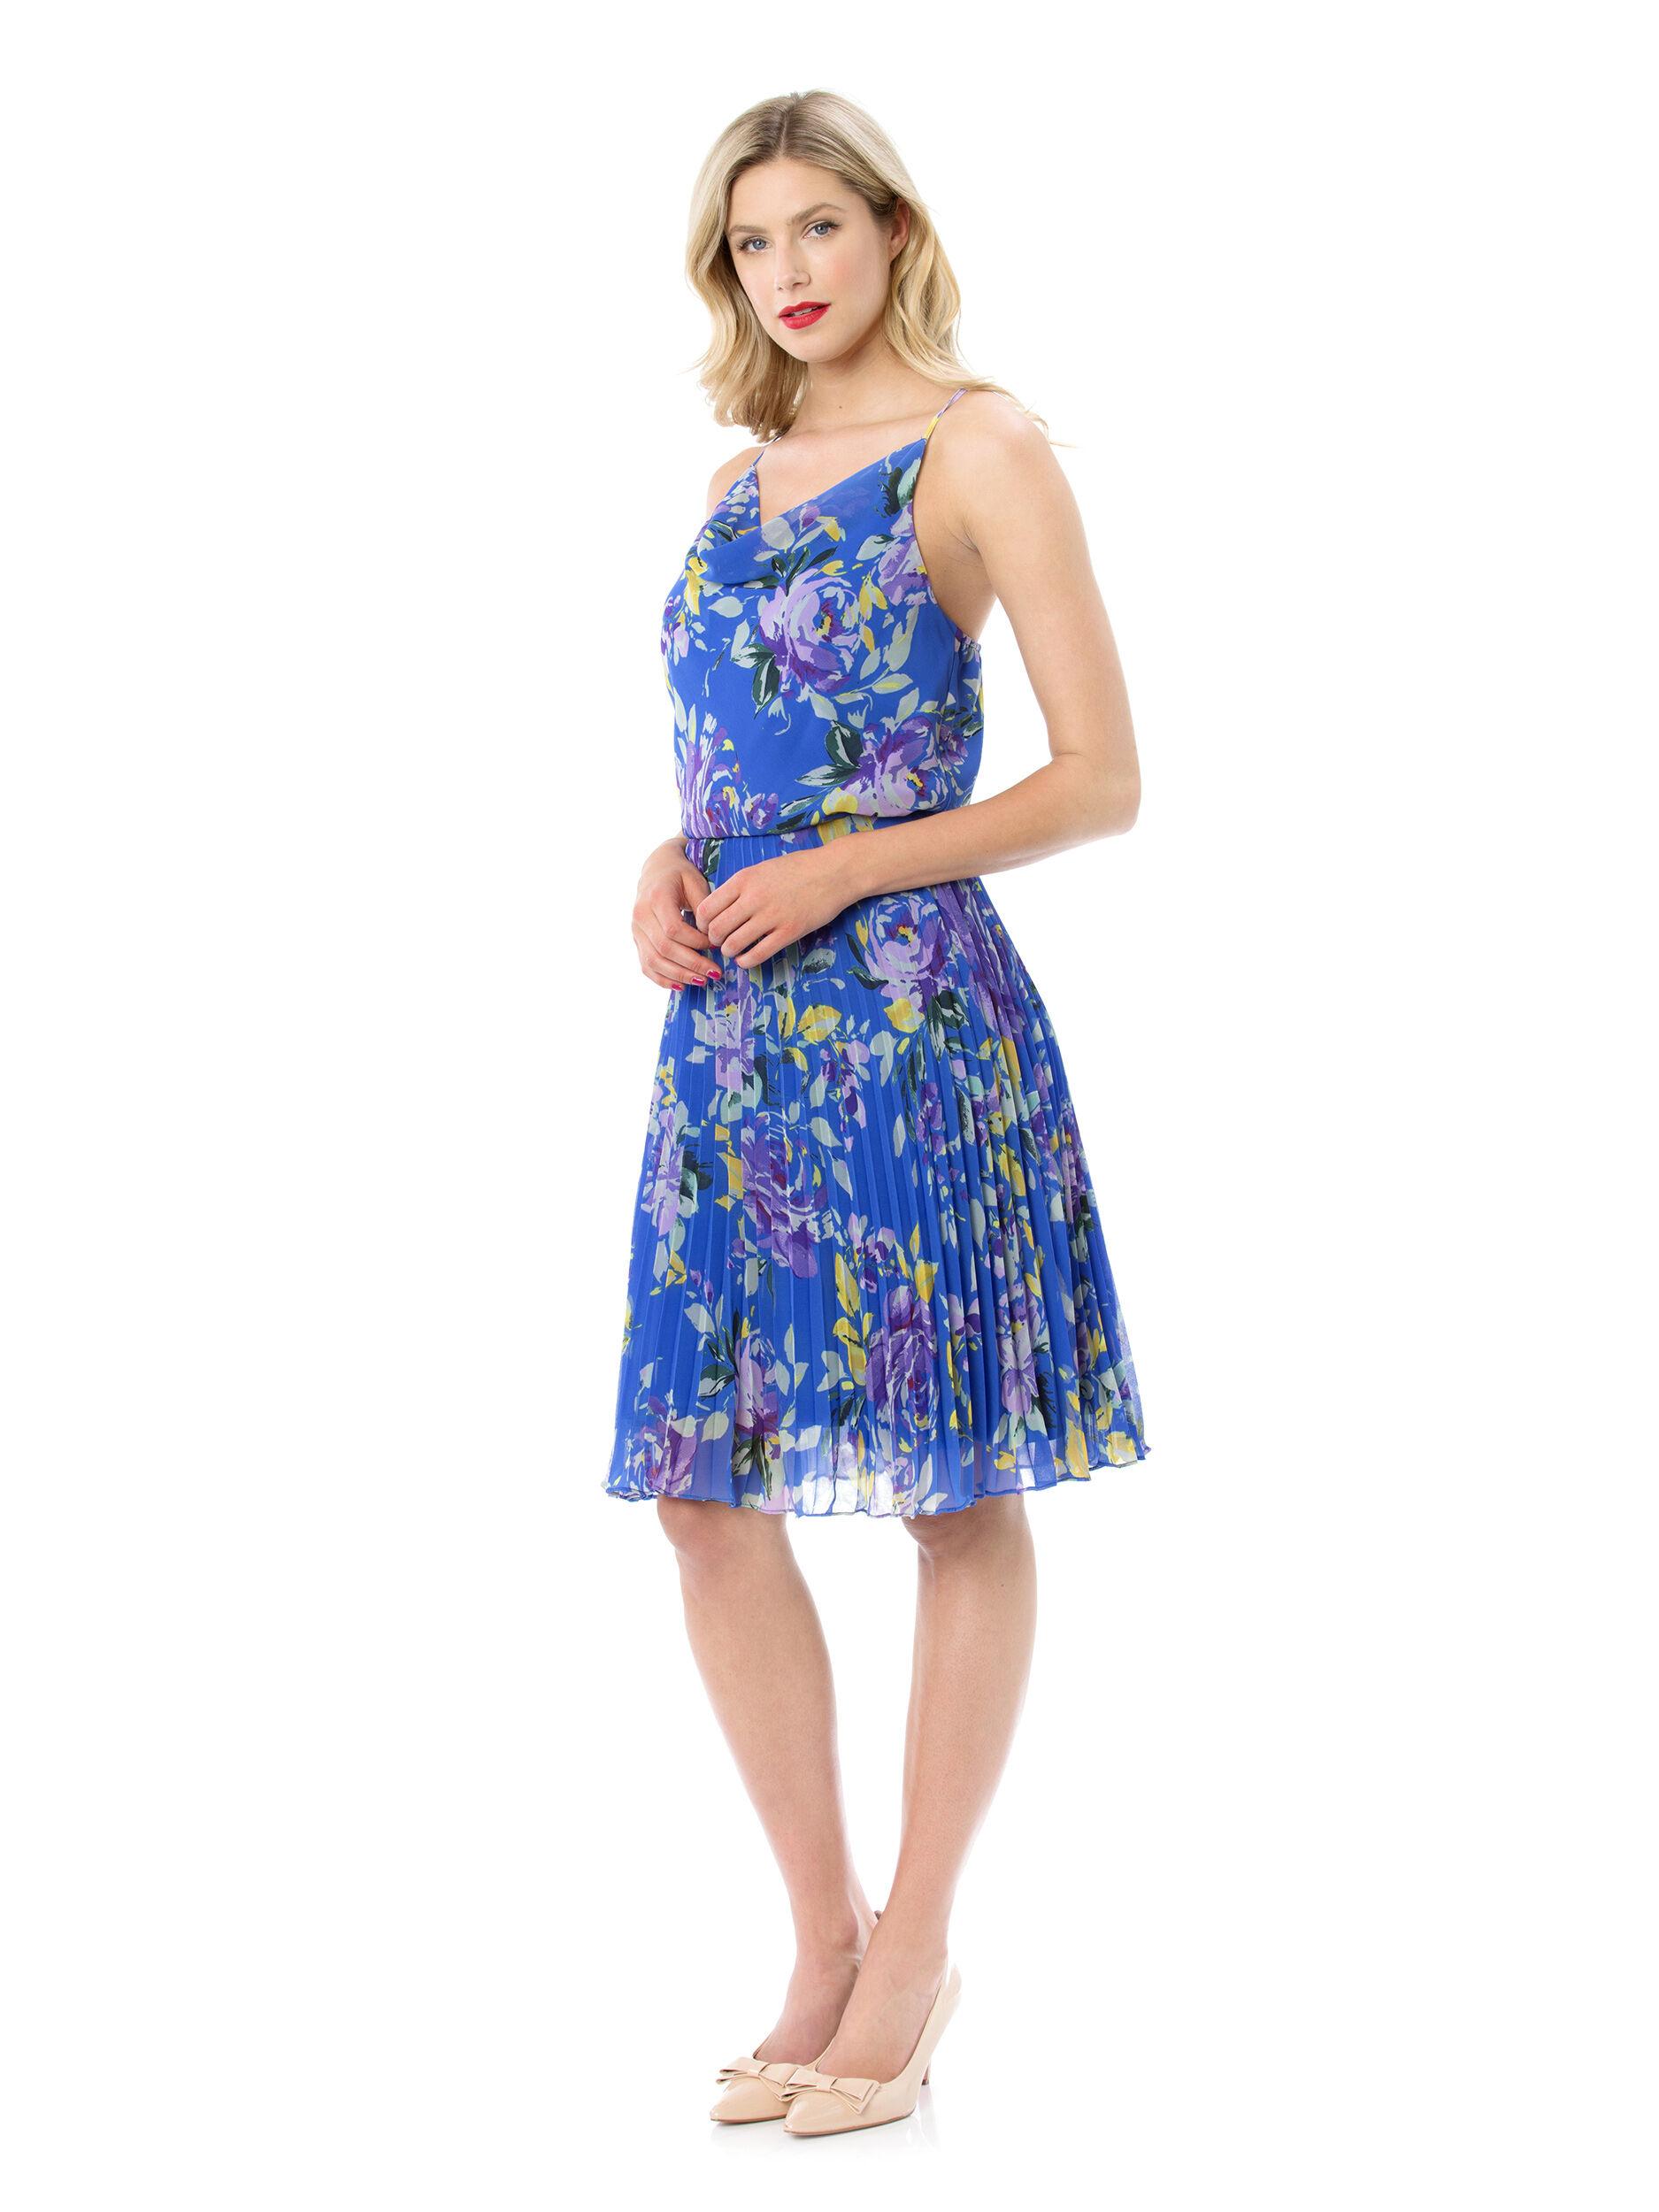 Wild Iris Dress